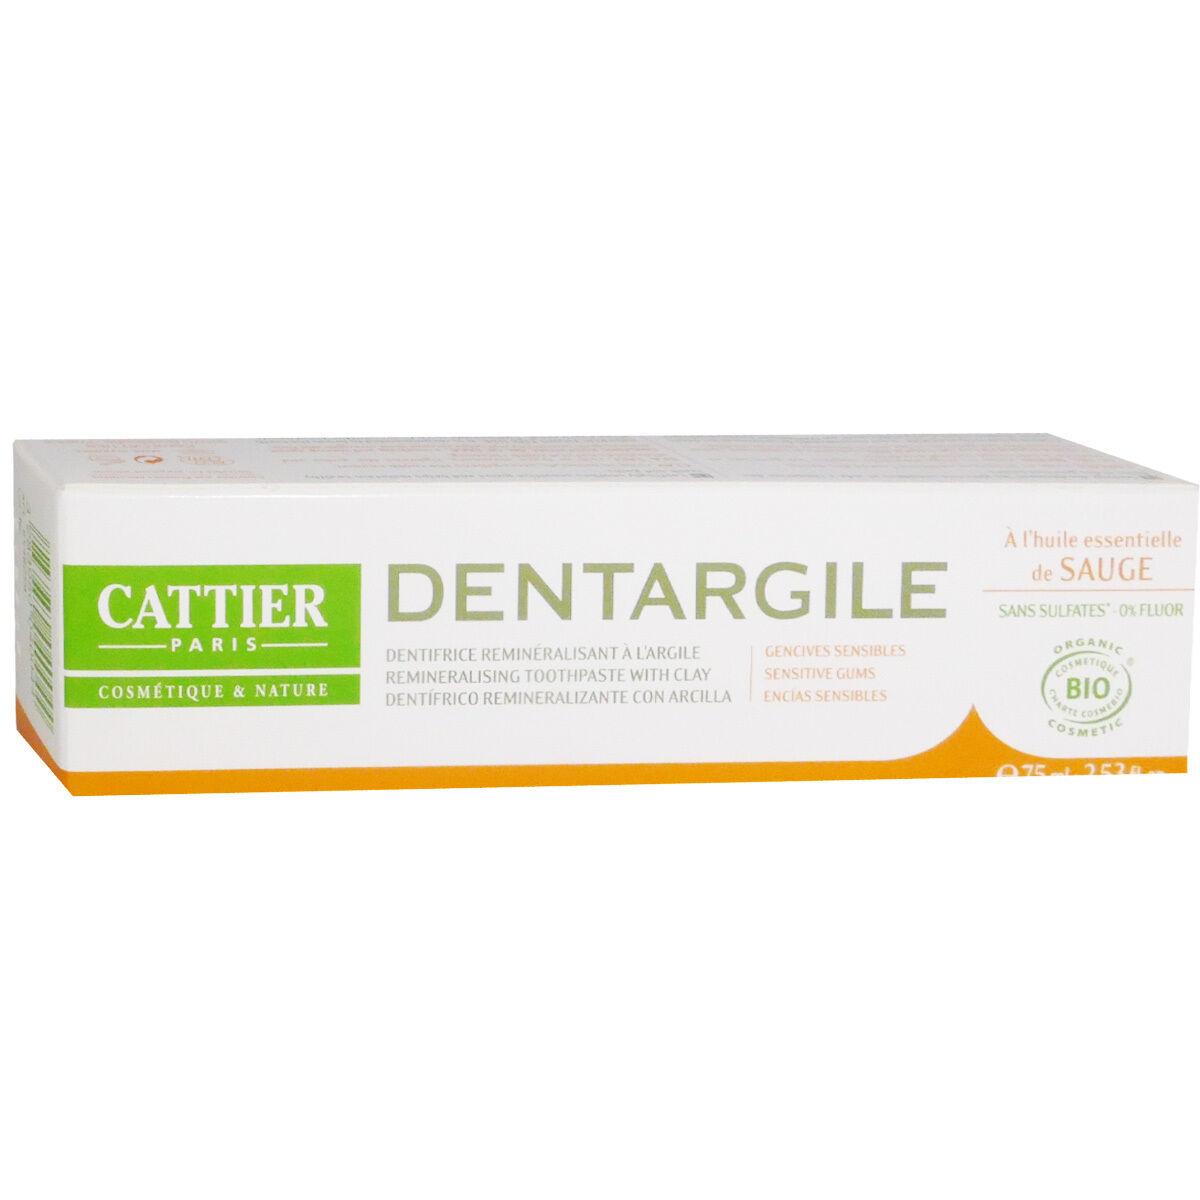 Cattier dentargile remineralisant argile 75 ml